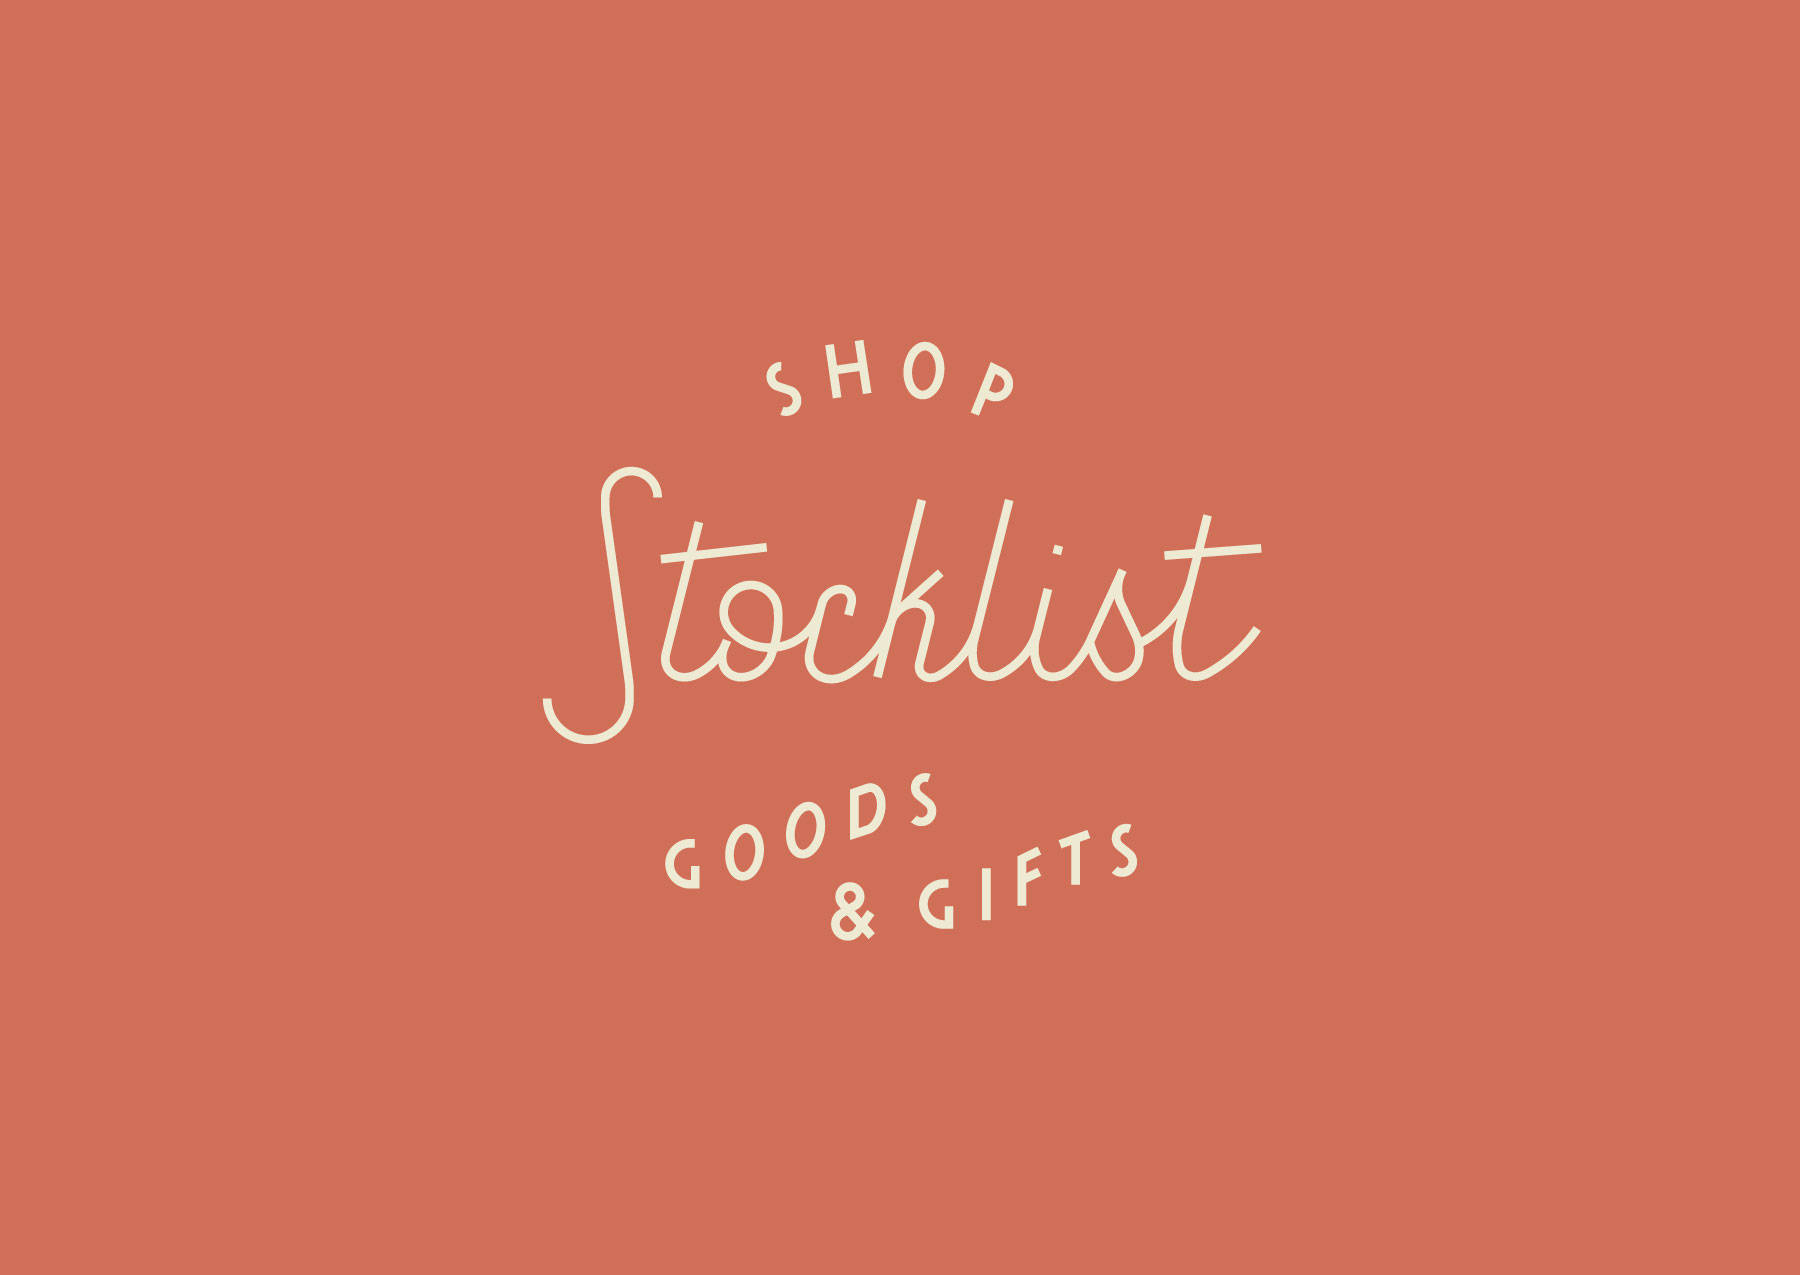 yrco_site_stocklist_2.jpg